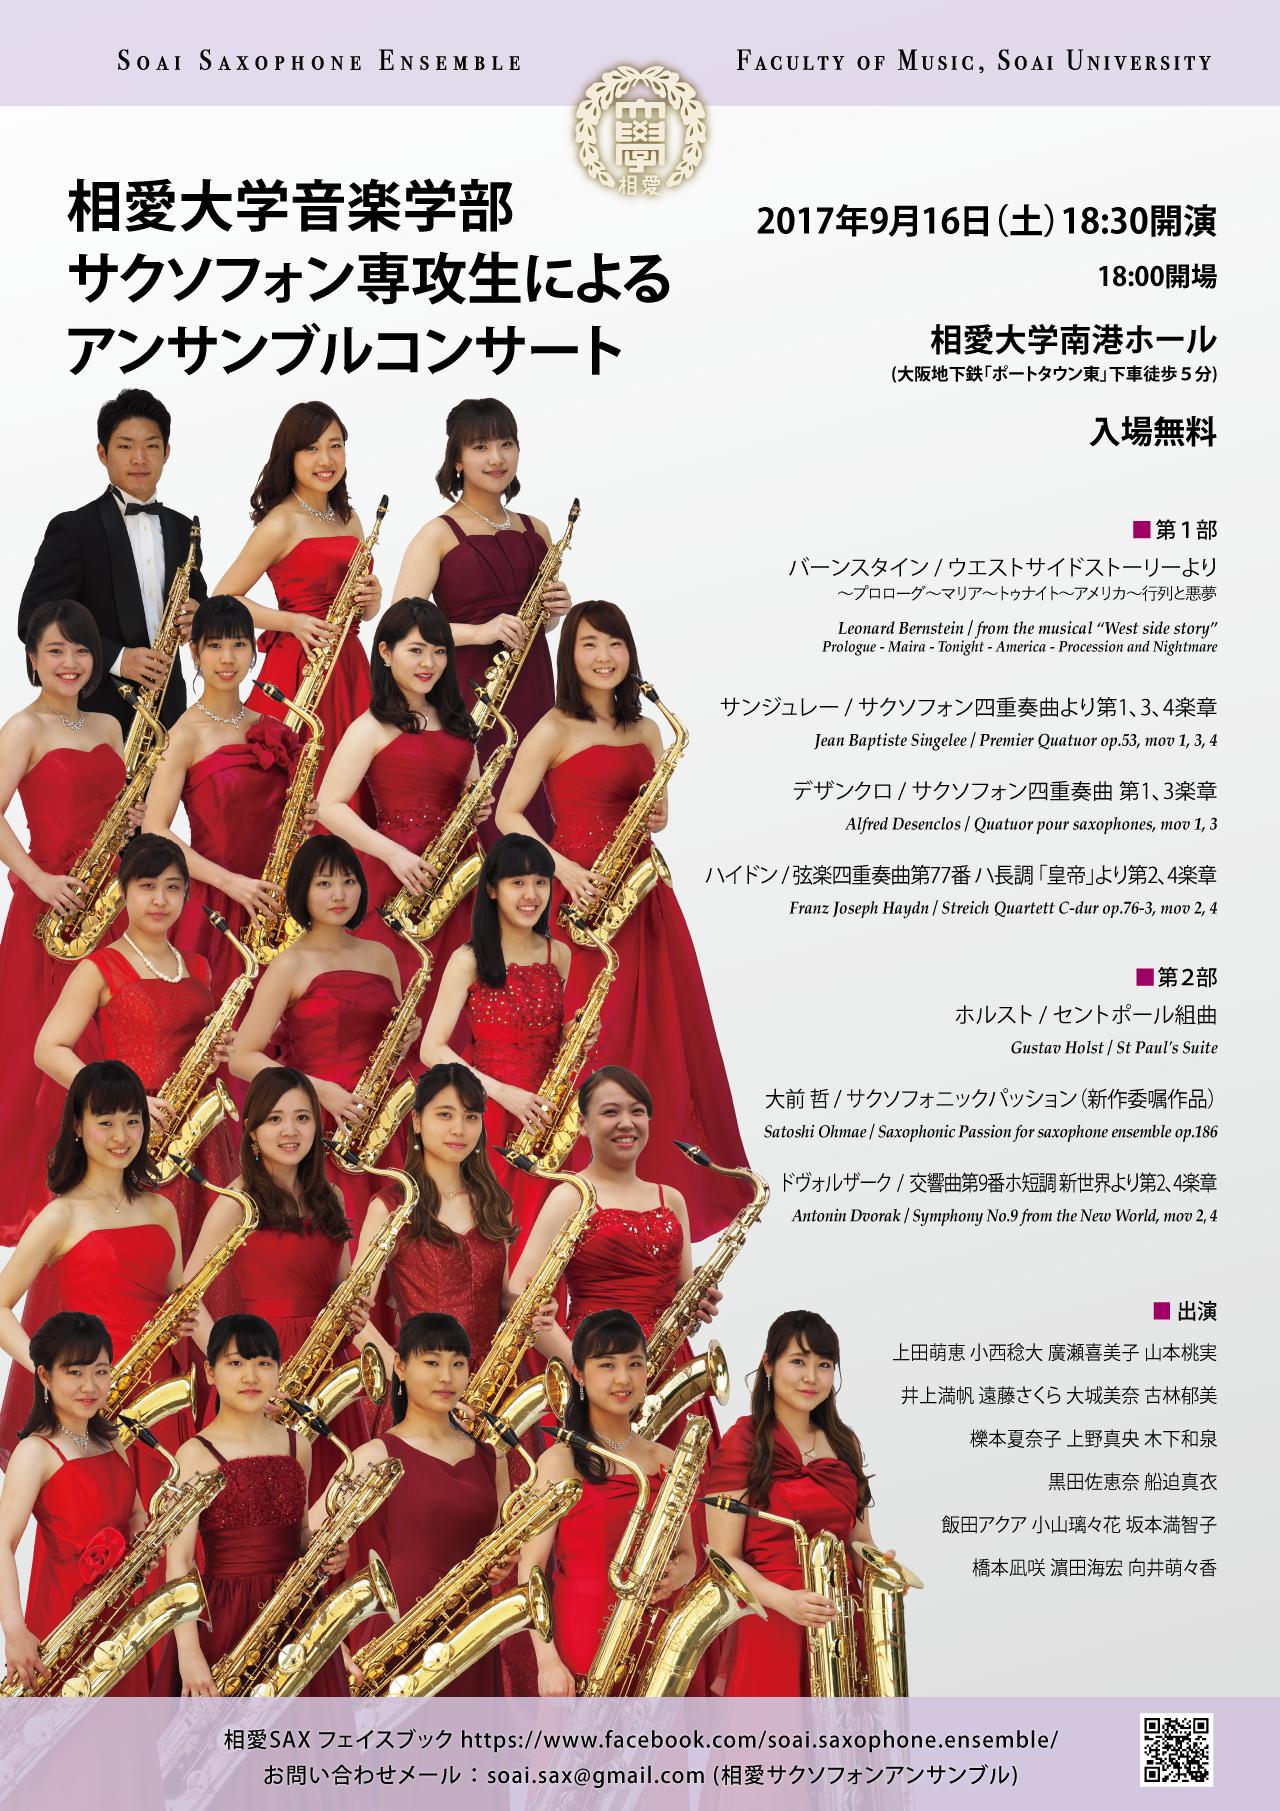 http://www.soai.ac.jp/information/concert/20170916SoaiSaxEnsemble.png